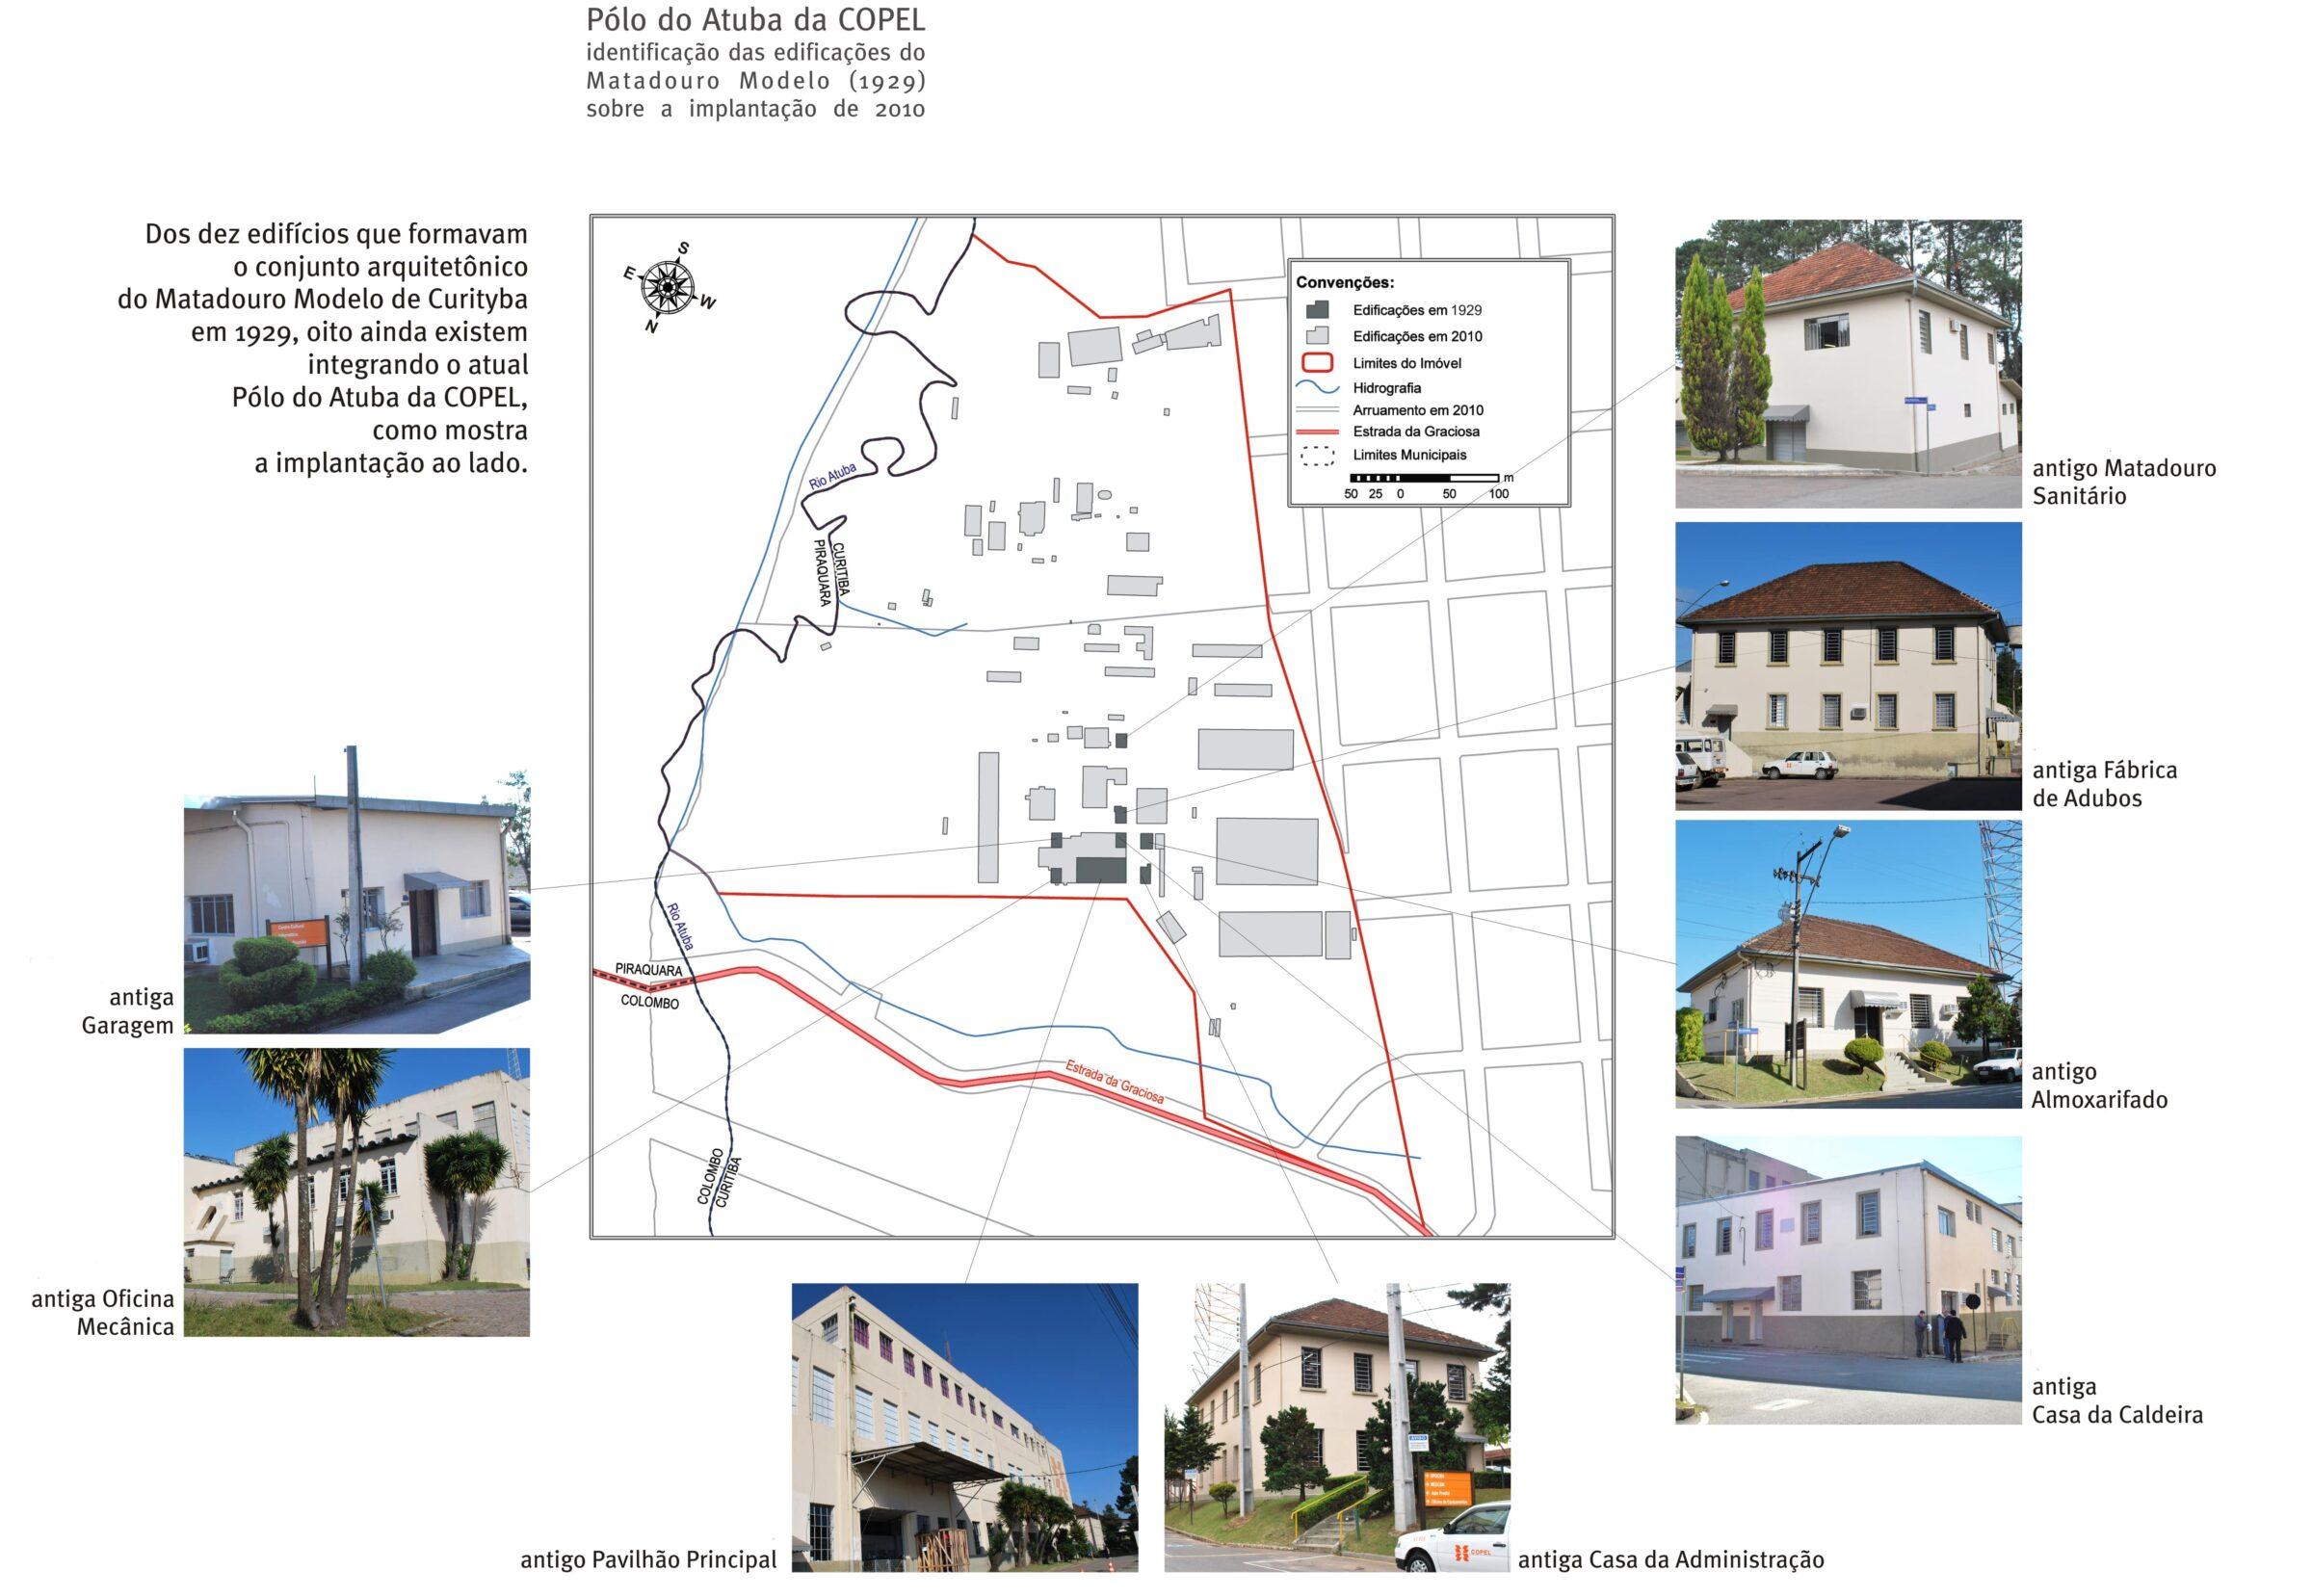 figura 1 o conjunto arquitetonico 2010